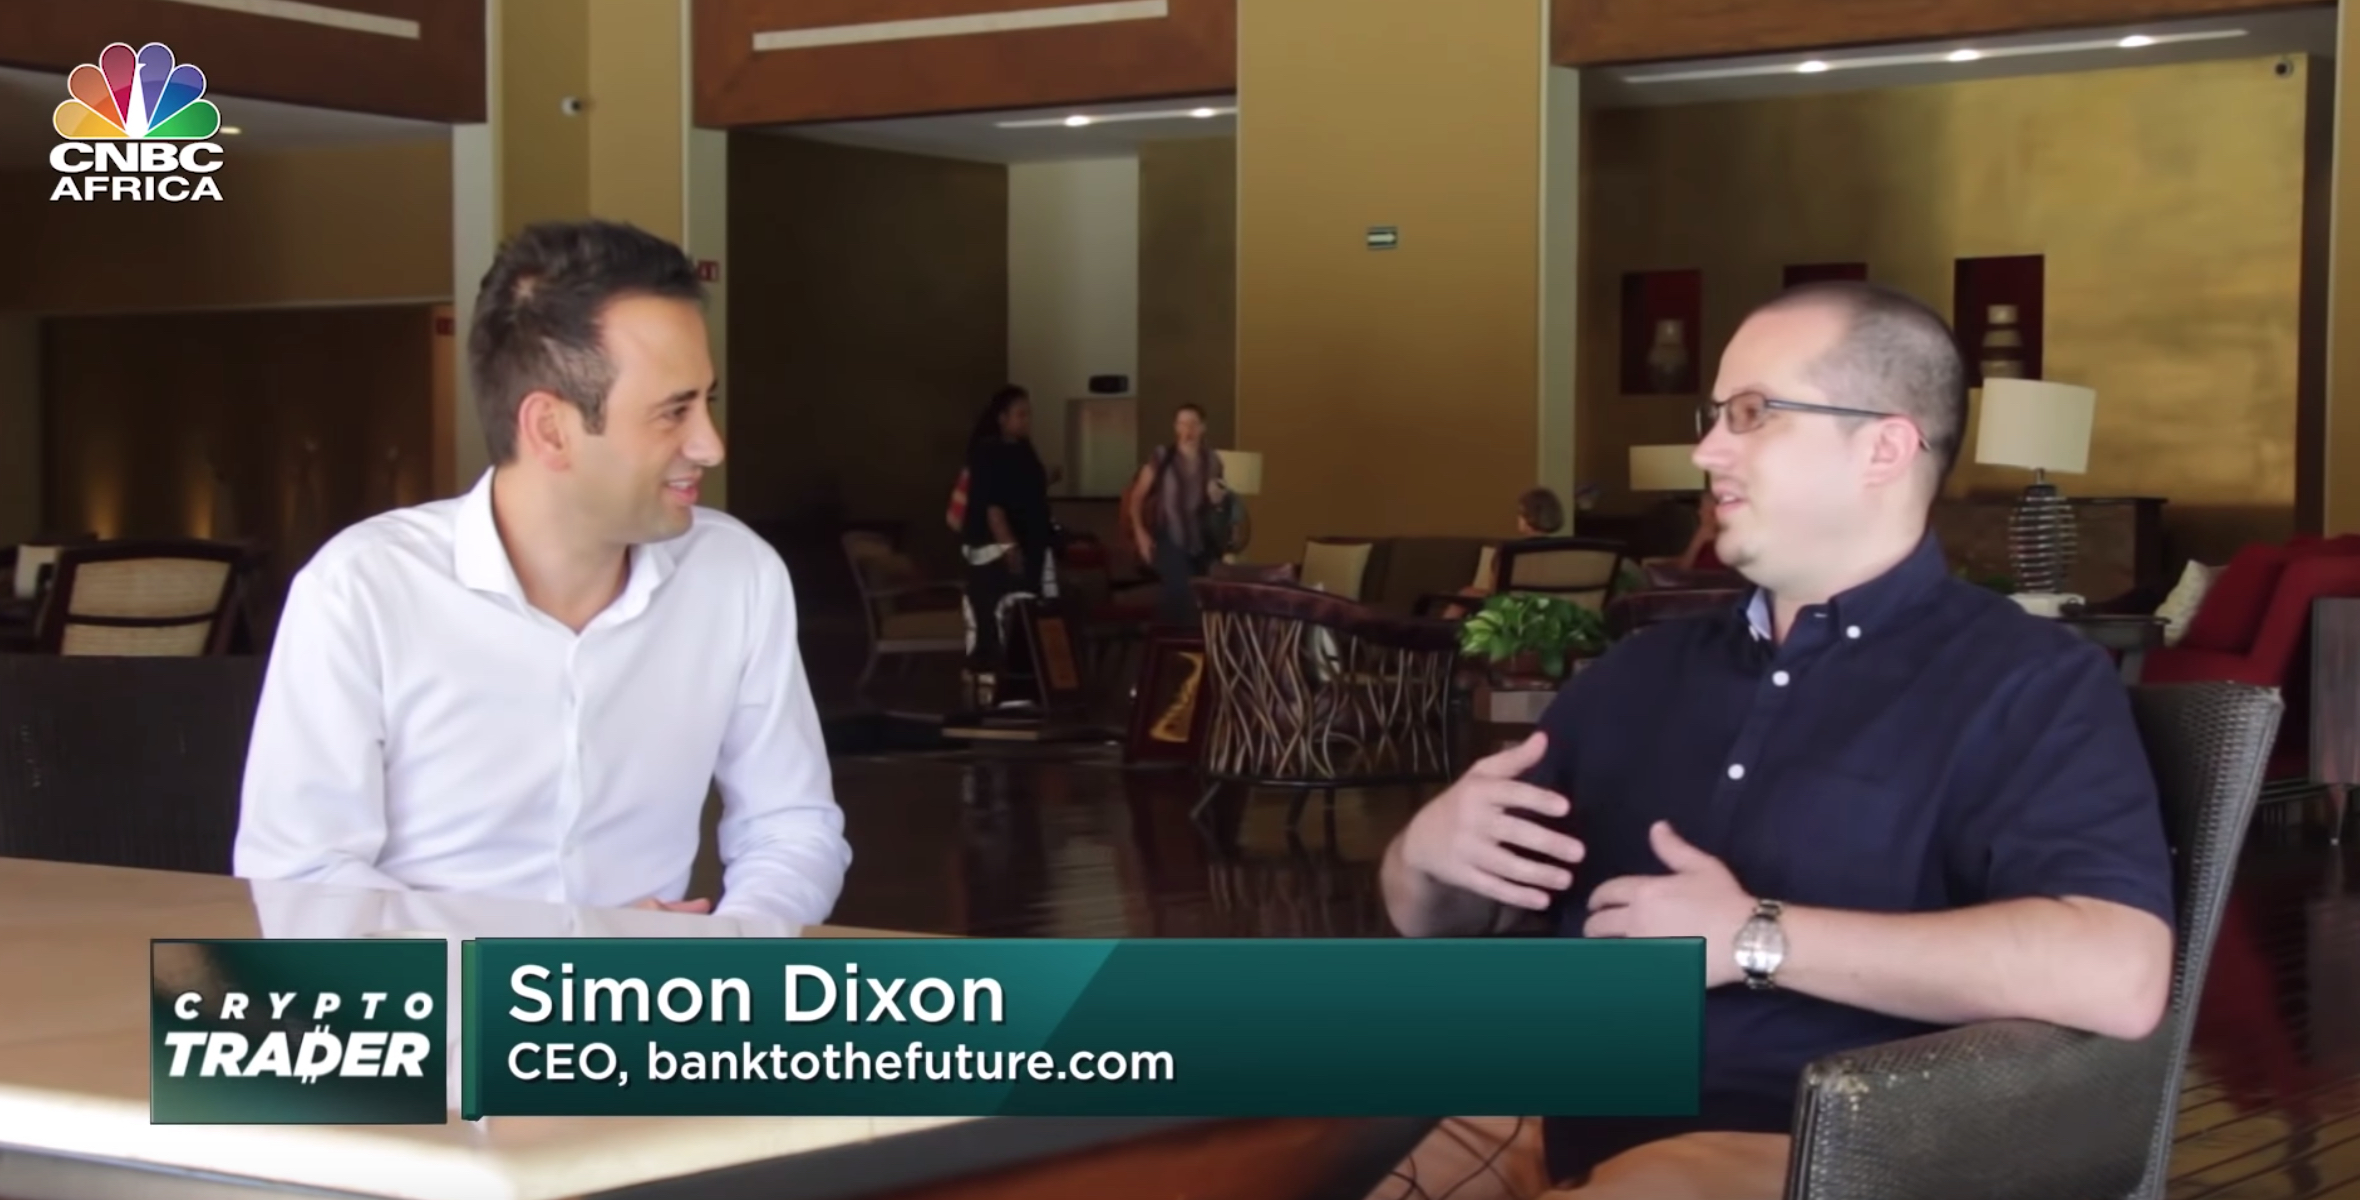 Simon Dixon CNBC Interview at Satoshi Roundtable